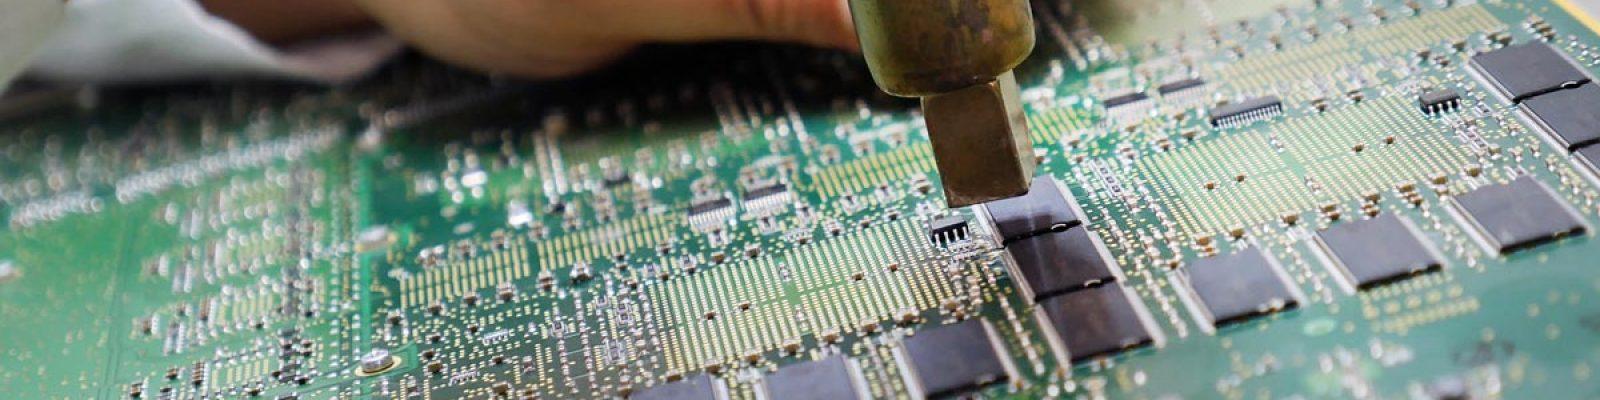 computer-club-limburg-computers-reparatie